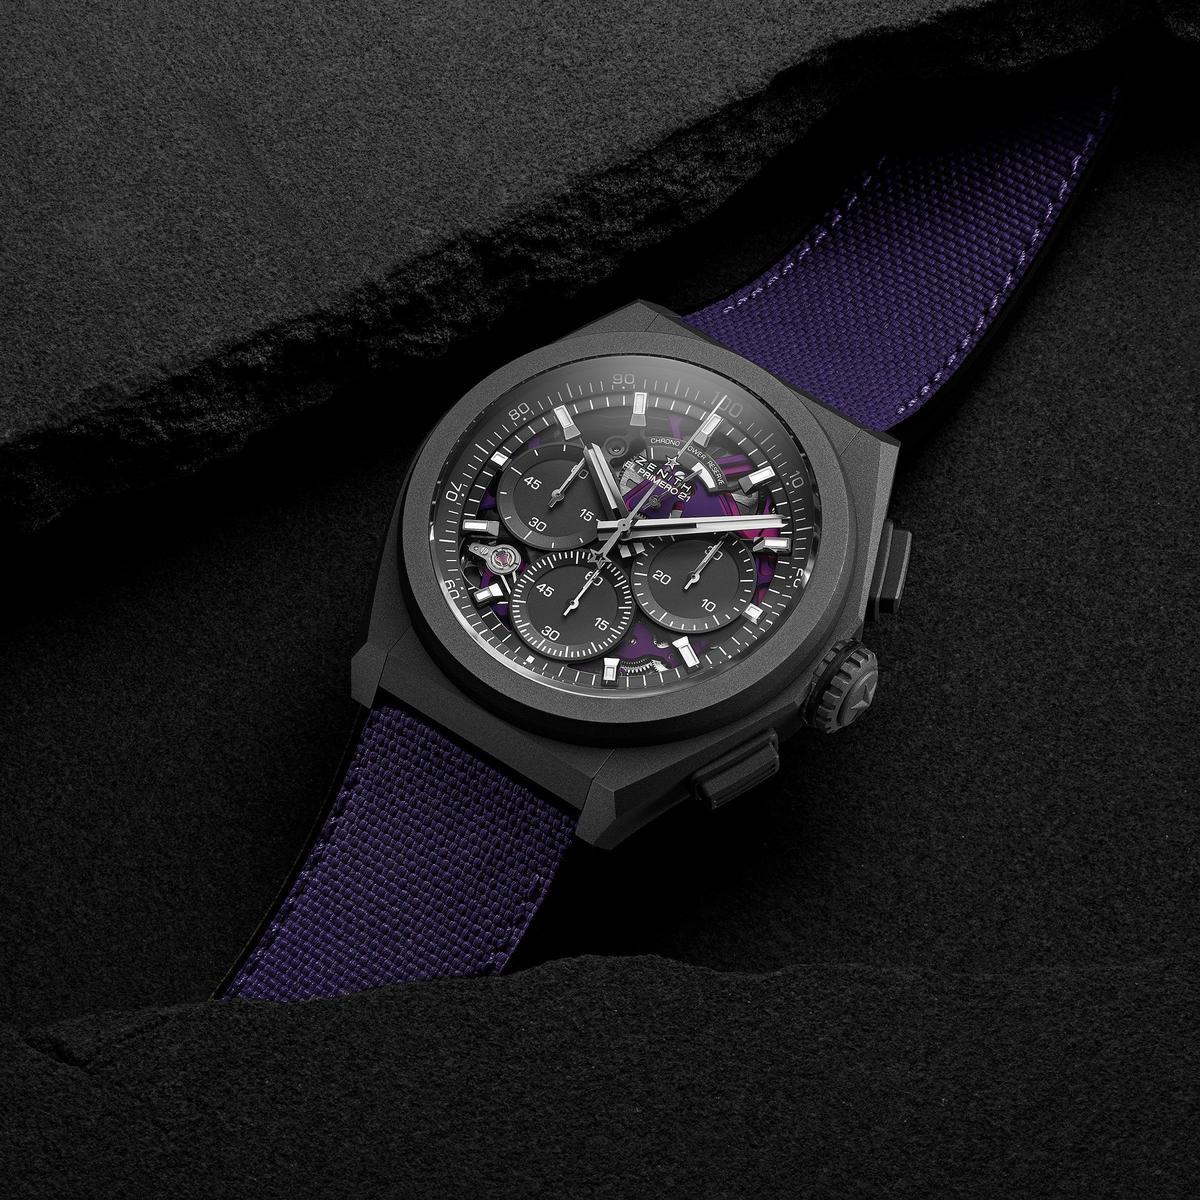 ZENITH把彩色玩到機芯上,未來預告有更多繽紛選擇。Defy El Primero 21 Ultraviolet腕錶,定價NT$430,600。